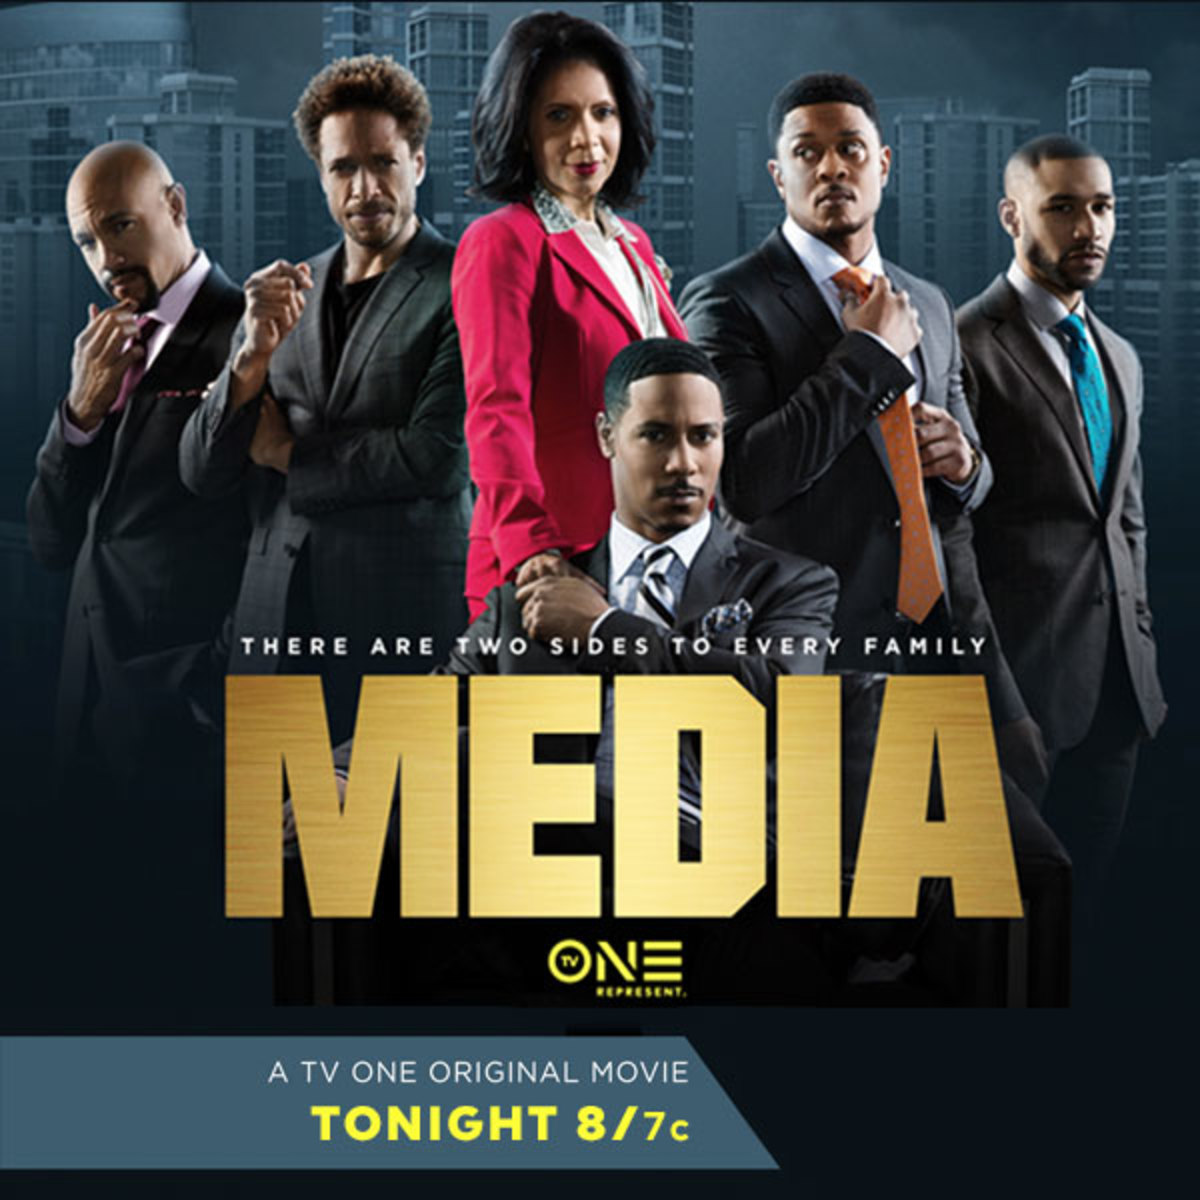 media_tonight_keyart